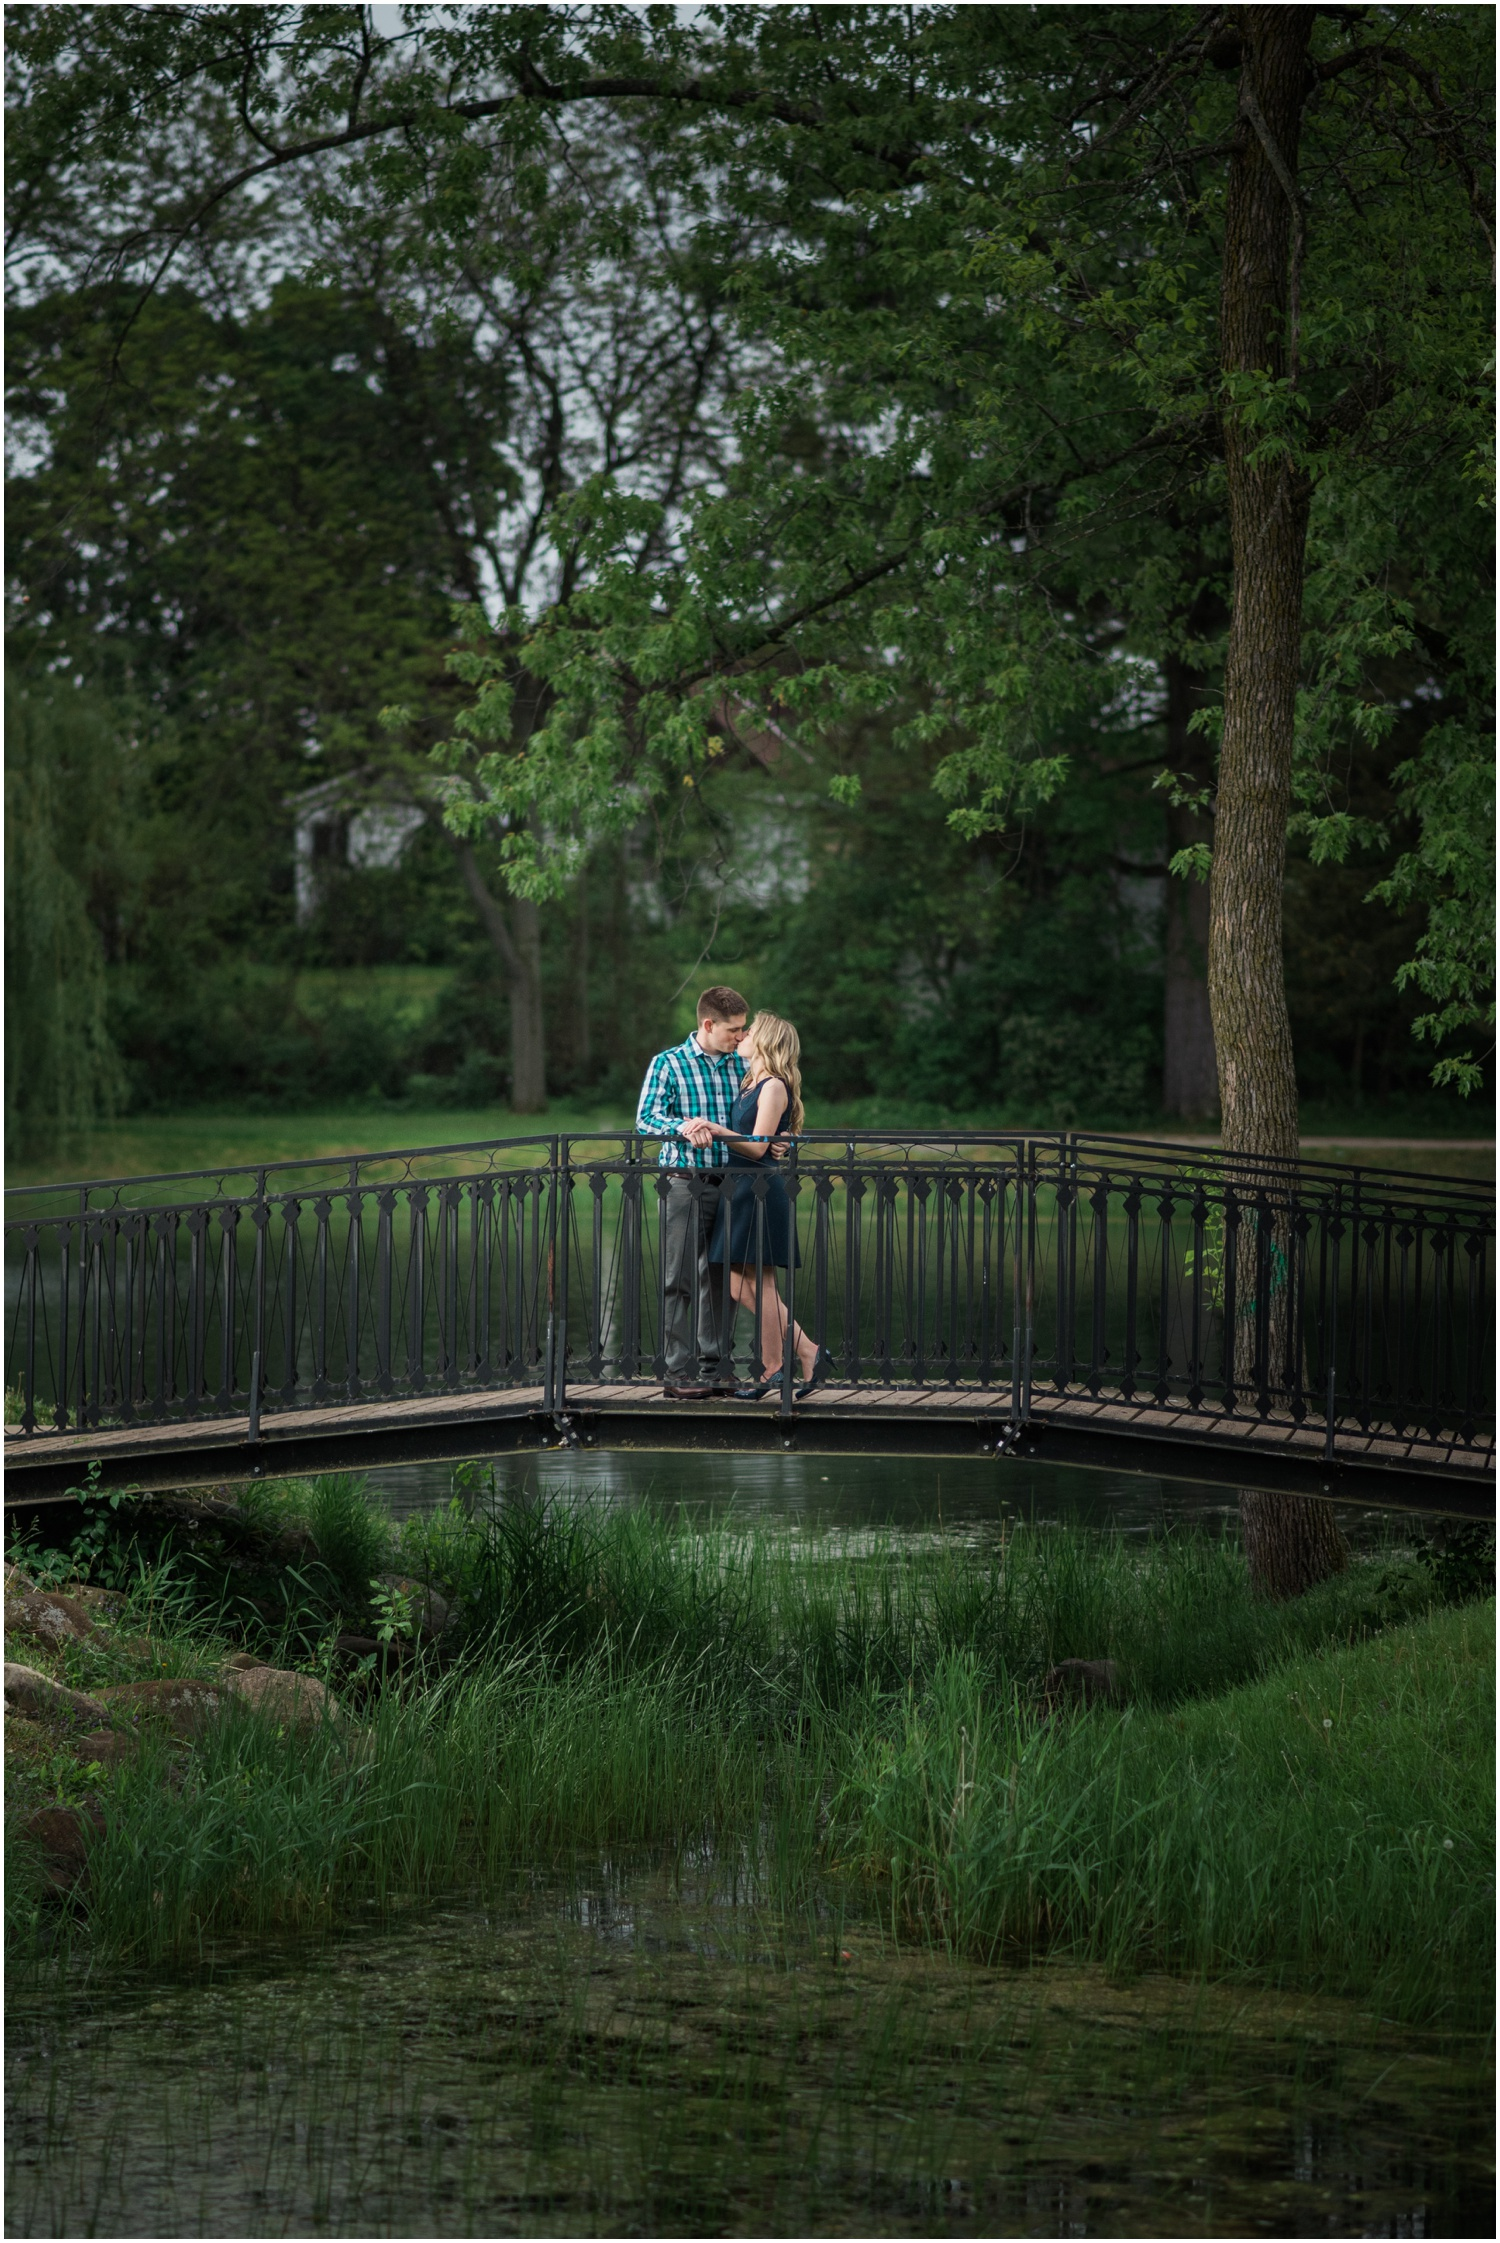 Paquette_Park_Portage_WI_Engagement_Photos_Heather_and_Derek_0024.jpg